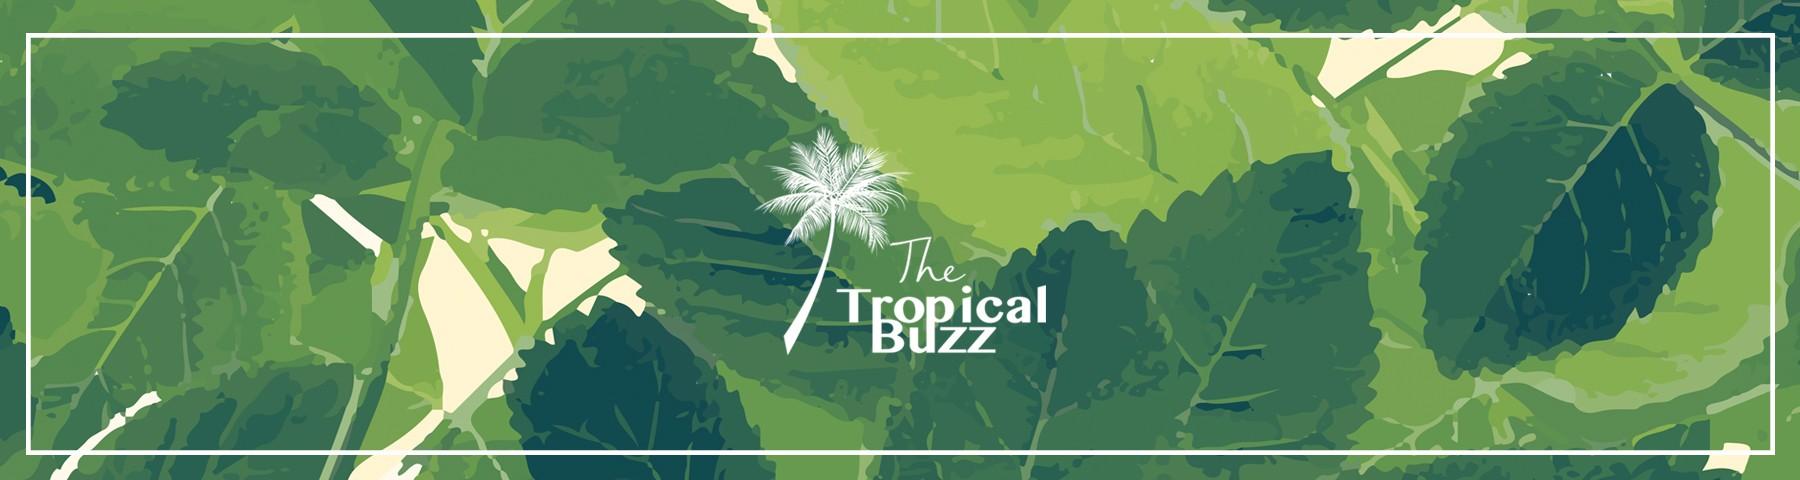 The tropical buzz